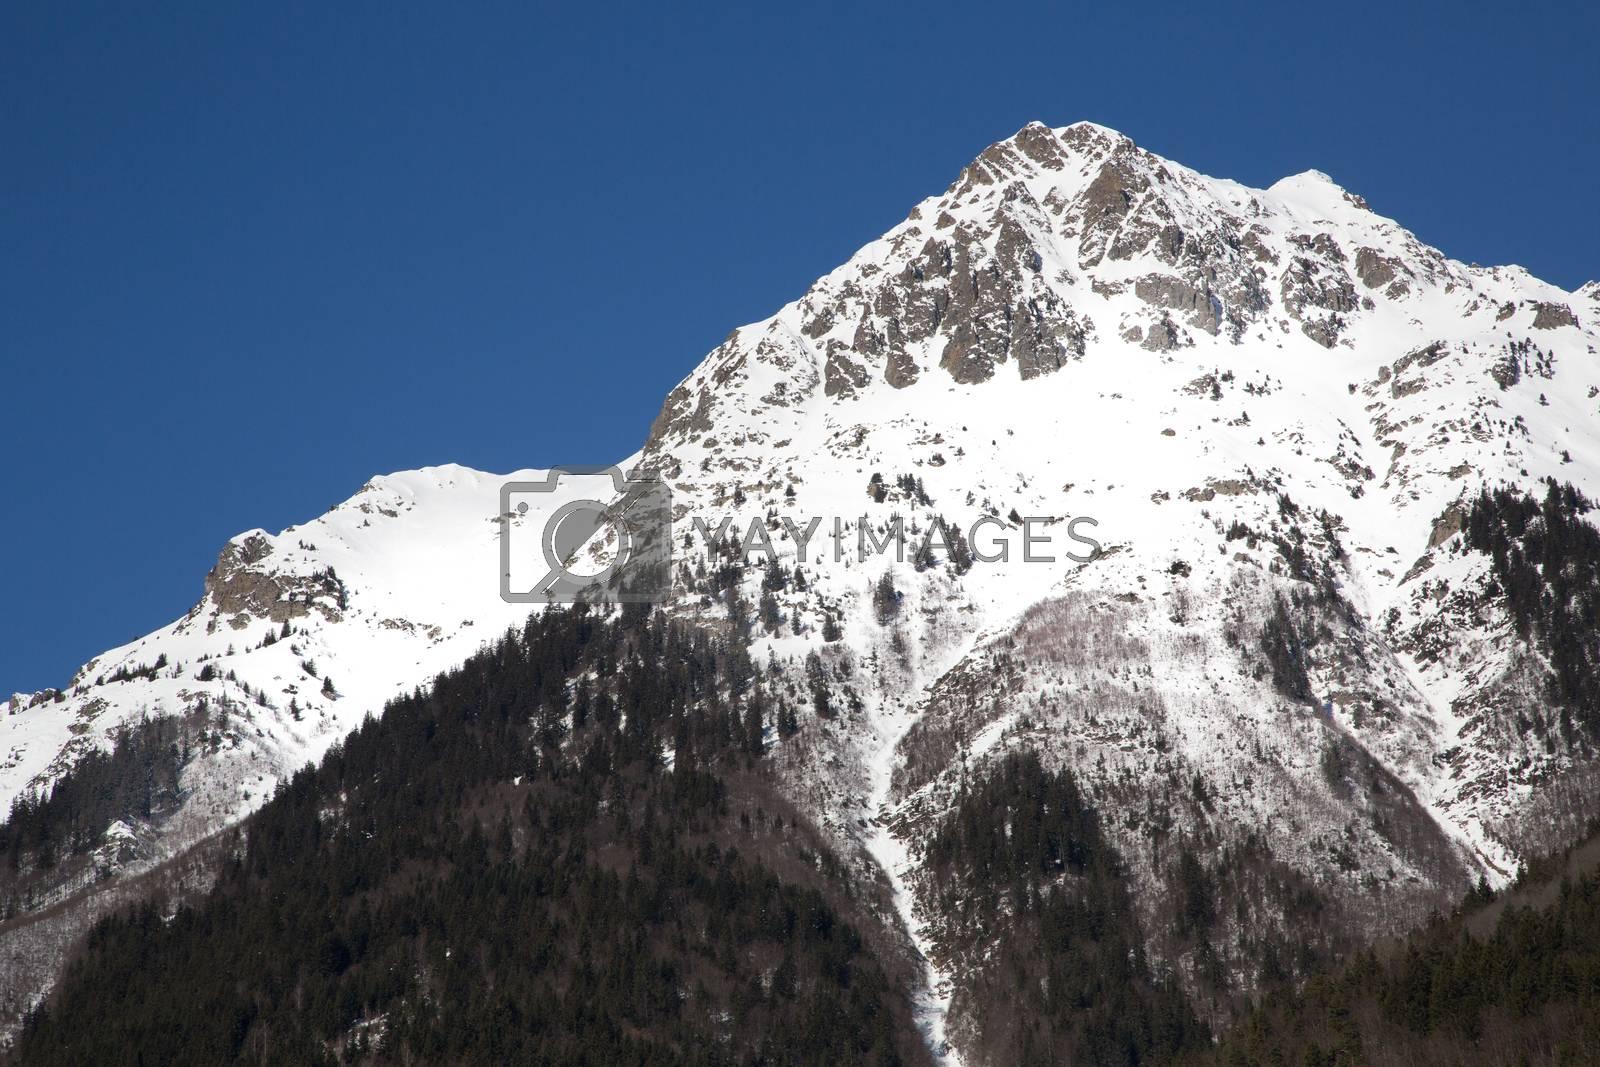 Alps in winter - 17 by Kartouchken